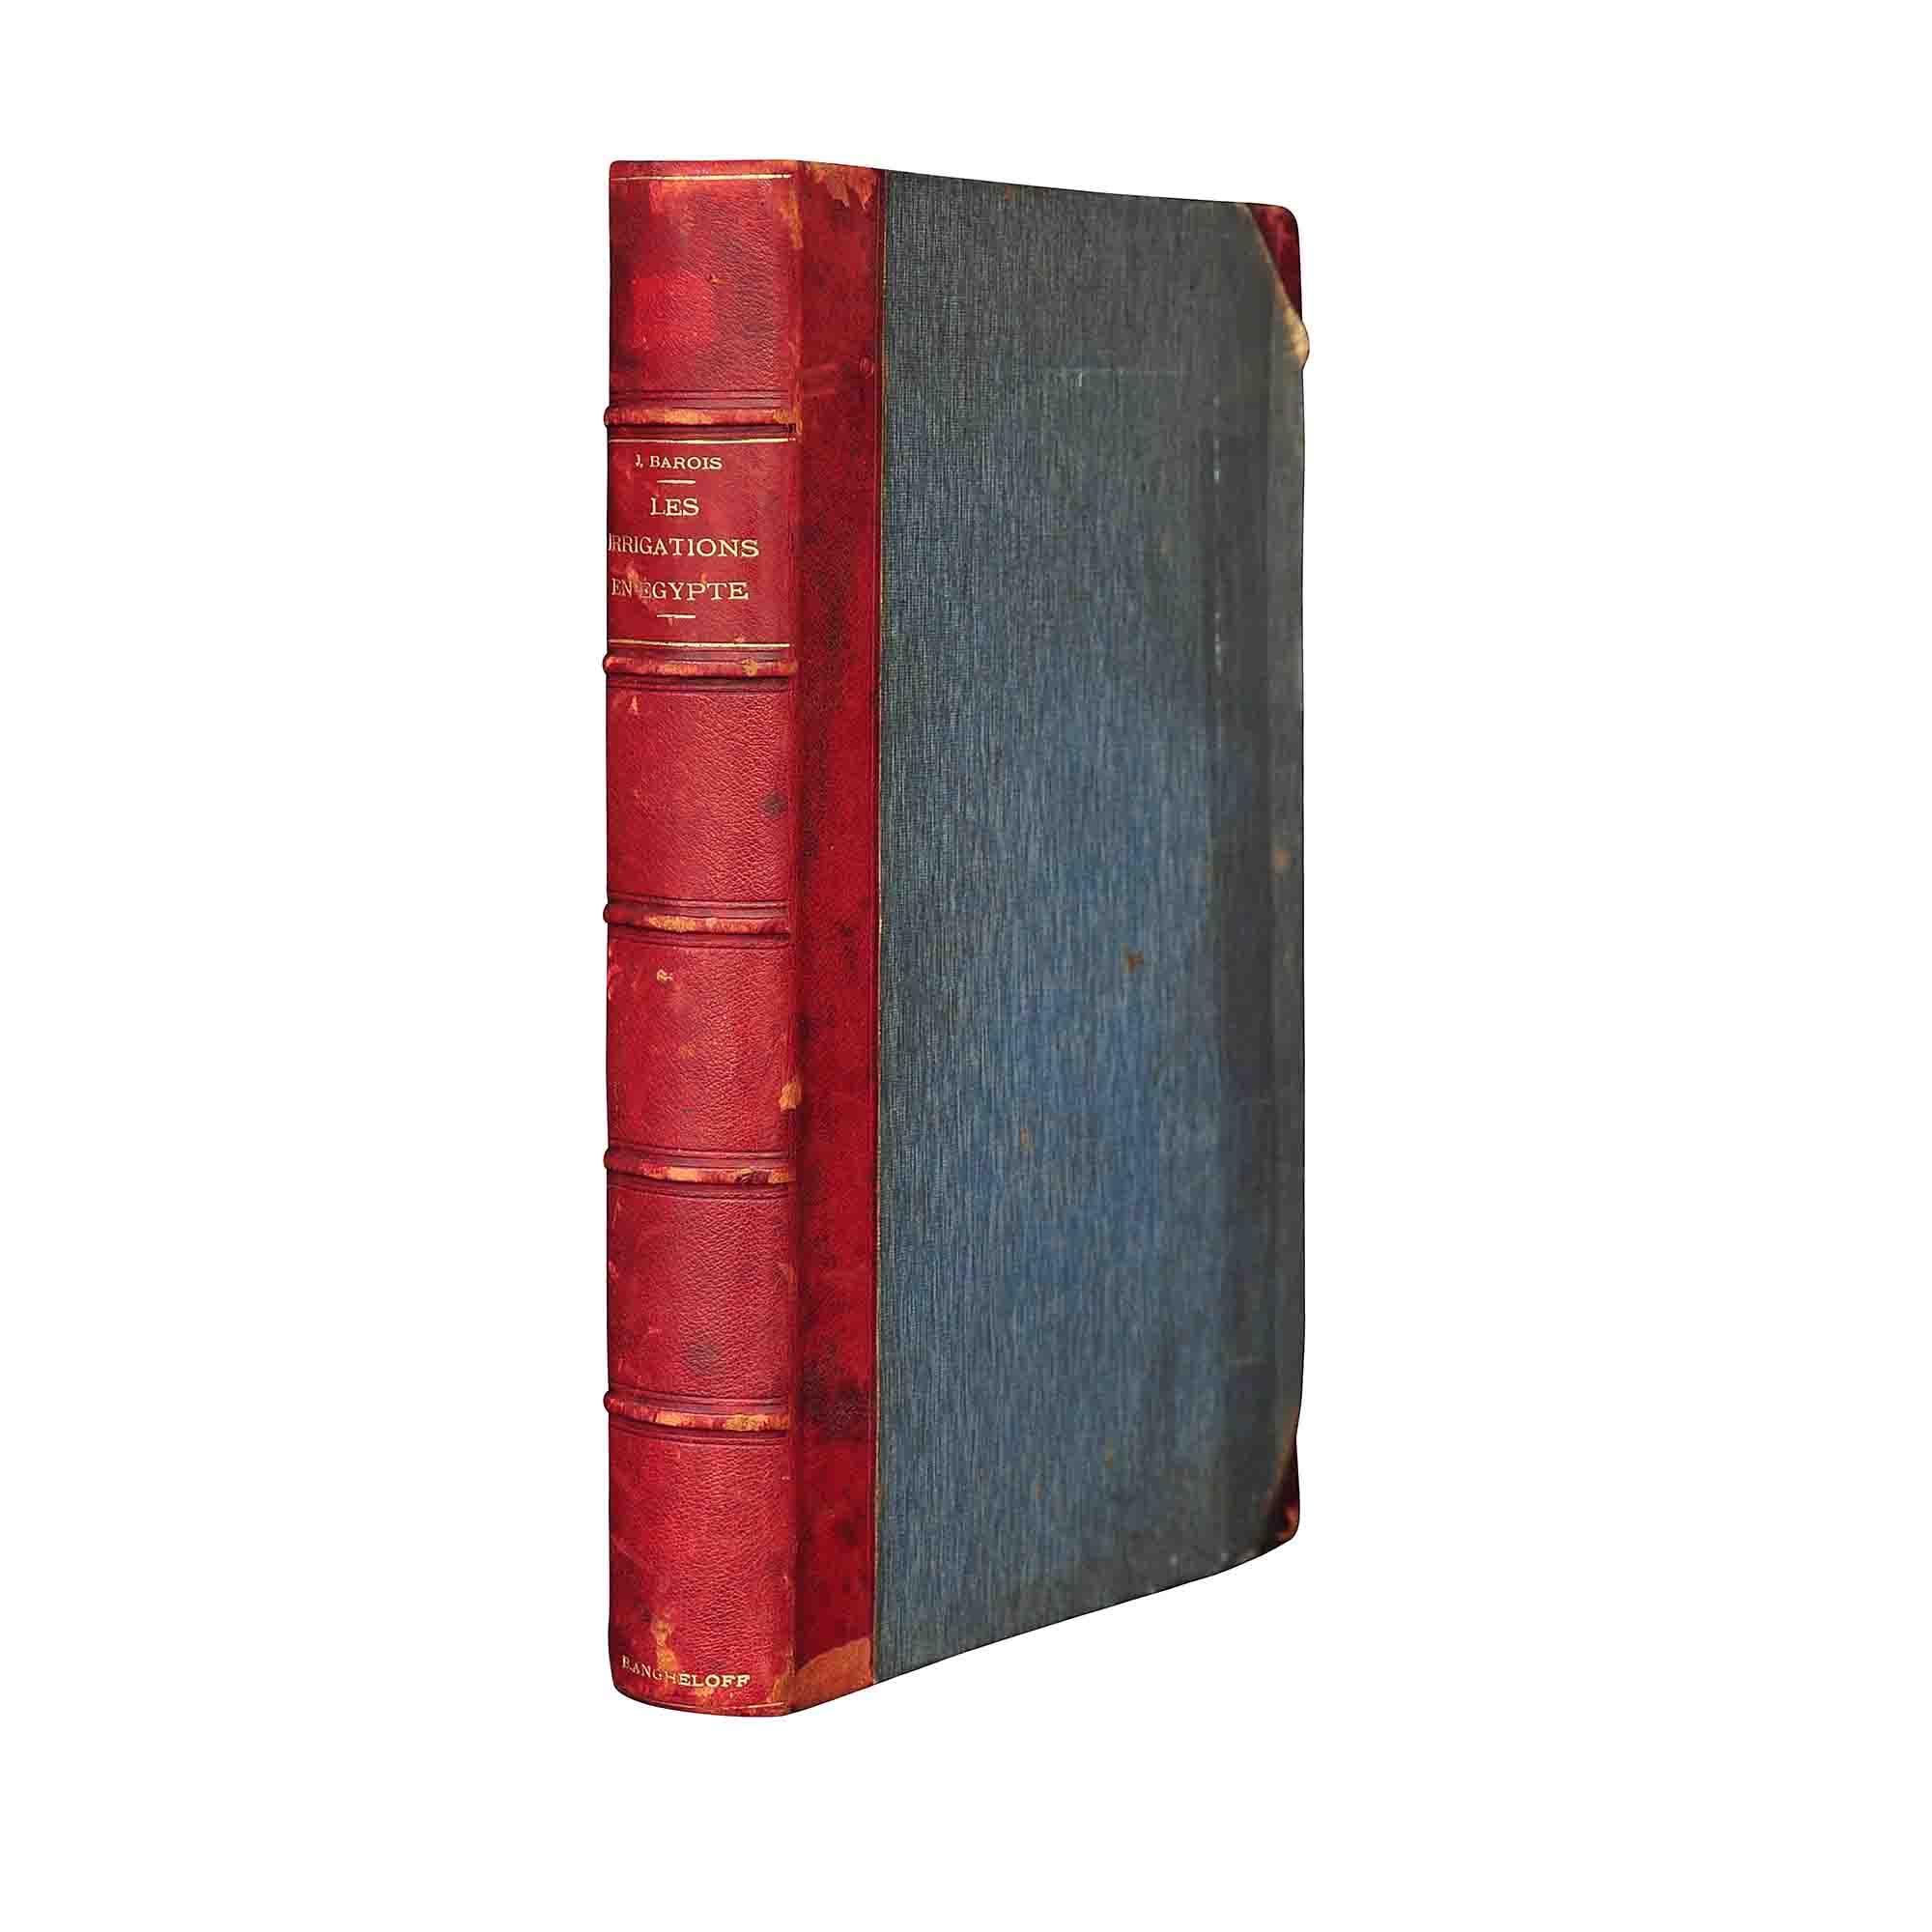 1175-Barois-Egpyt-Nil-1904-1-frei-A-N.jpg